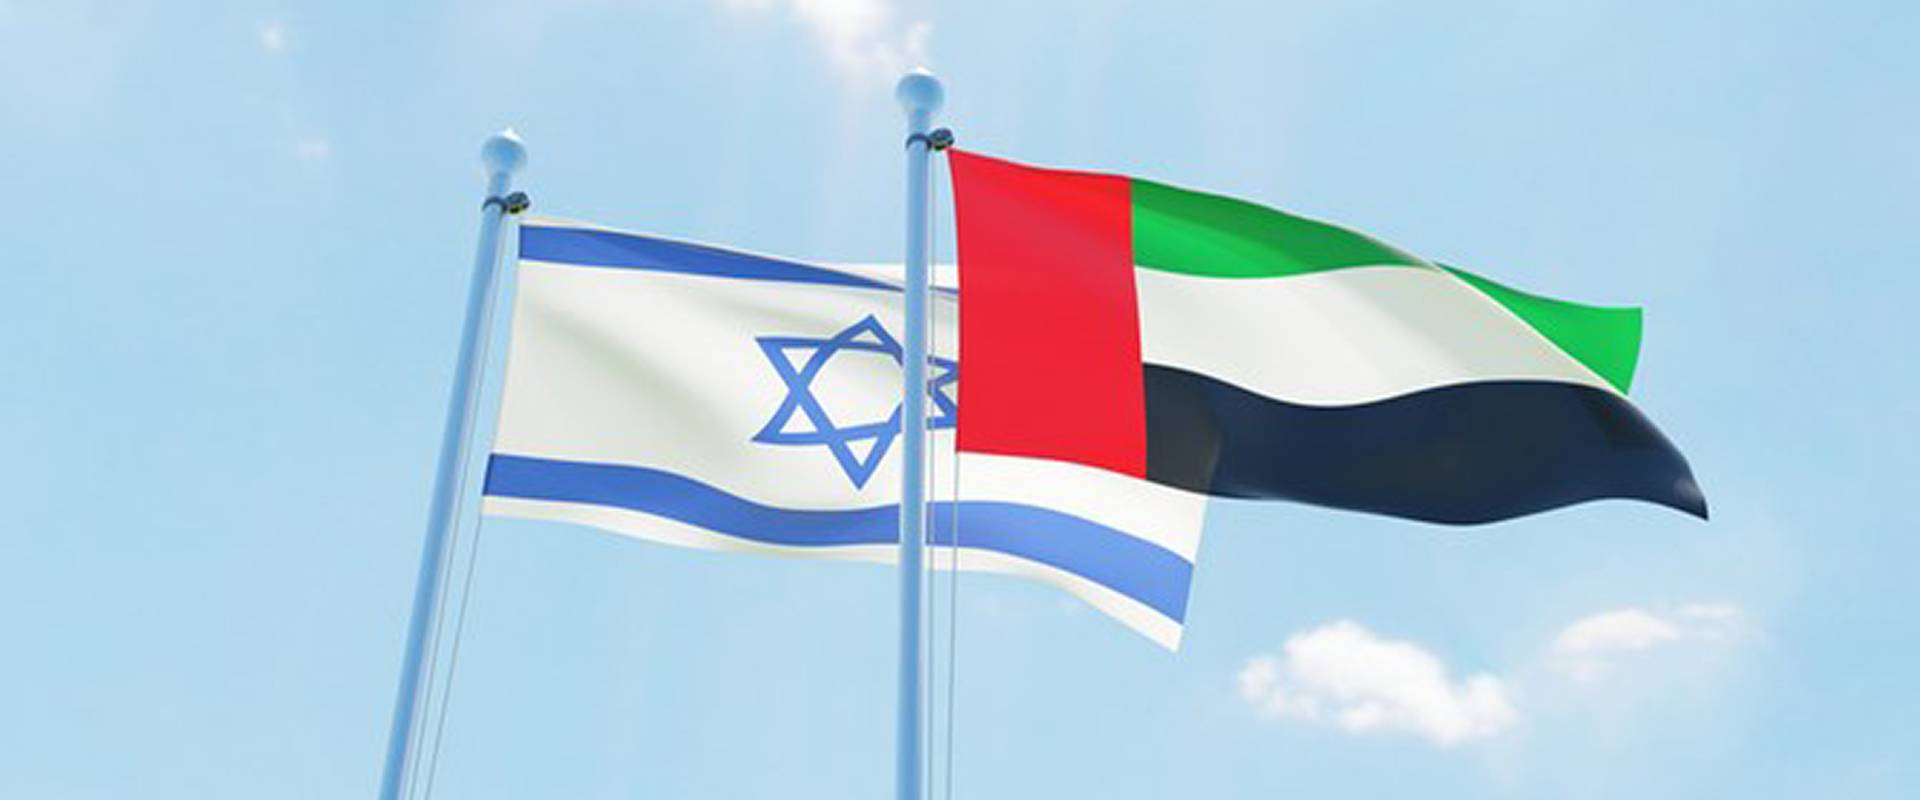 Andreas Krieg zu Israel, den VAE und Saudi-Arabien